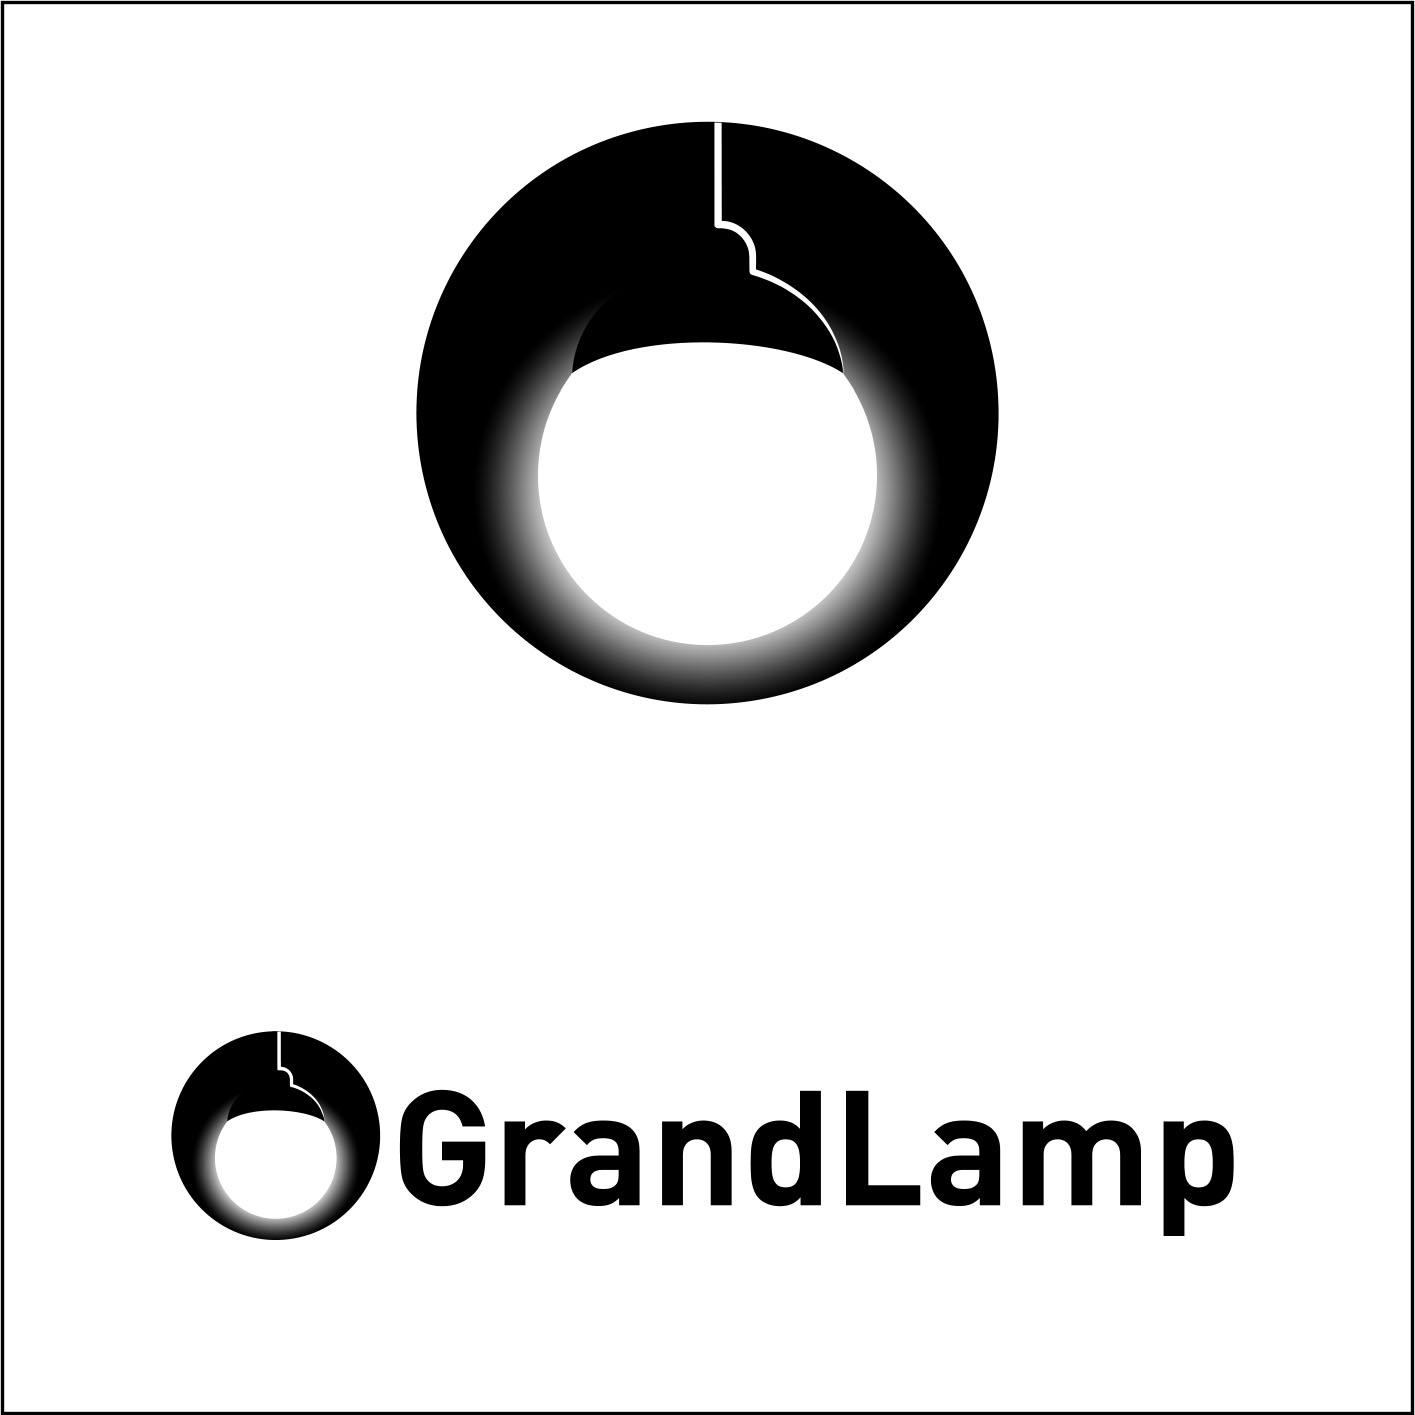 Разработка логотипа и элементов фирменного стиля фото f_78857df079f9b1d2.jpg